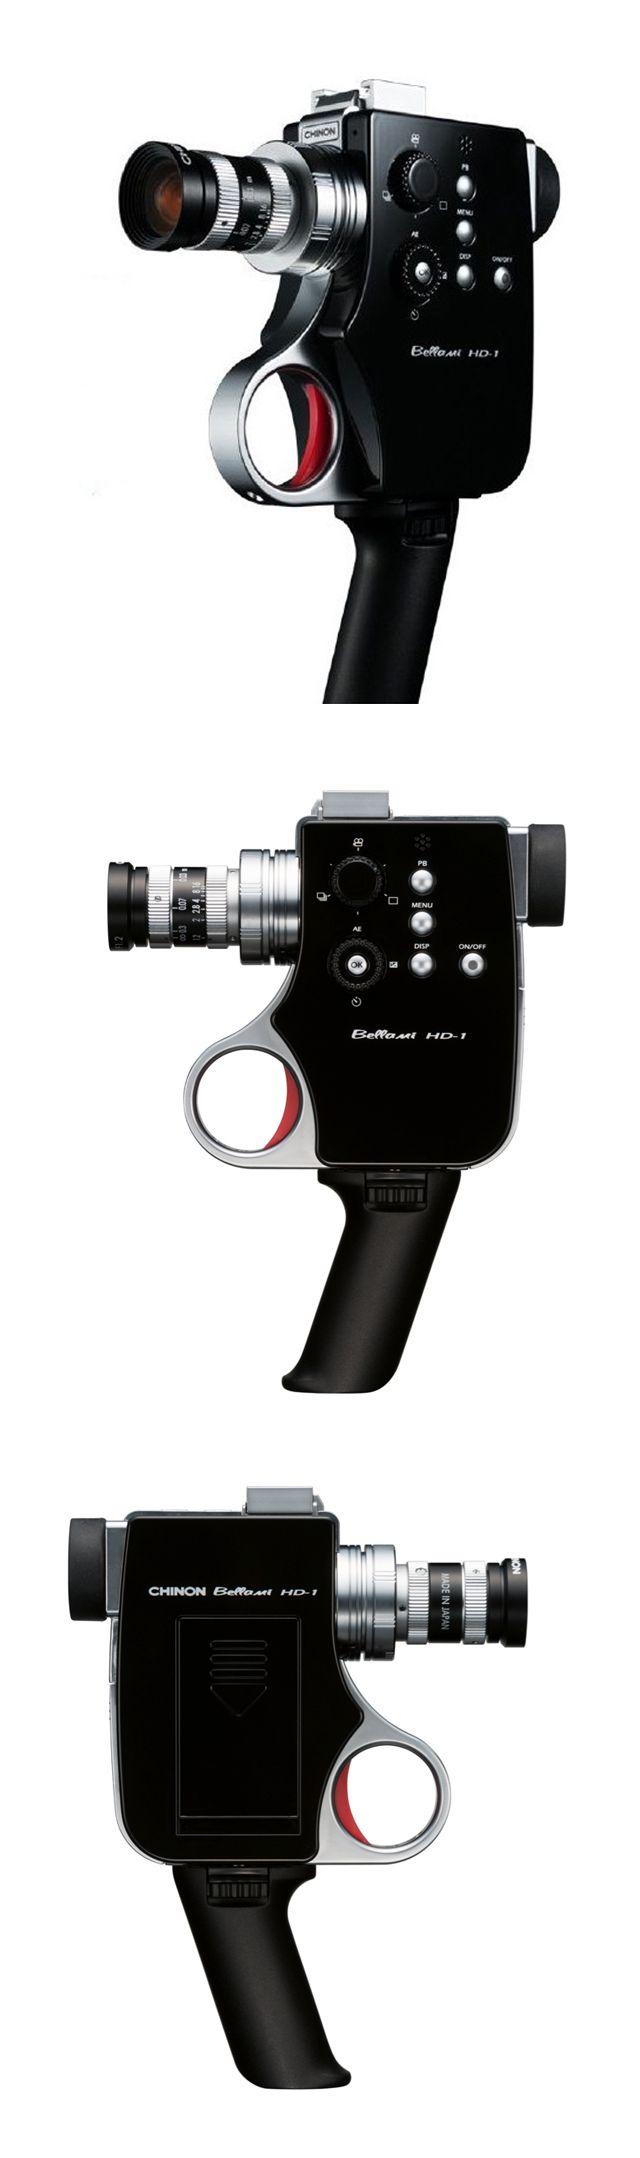 ☆ Chinon : Bellami HD-1 : Full HD Digital 8mm Interchangeable Lens Video Camera